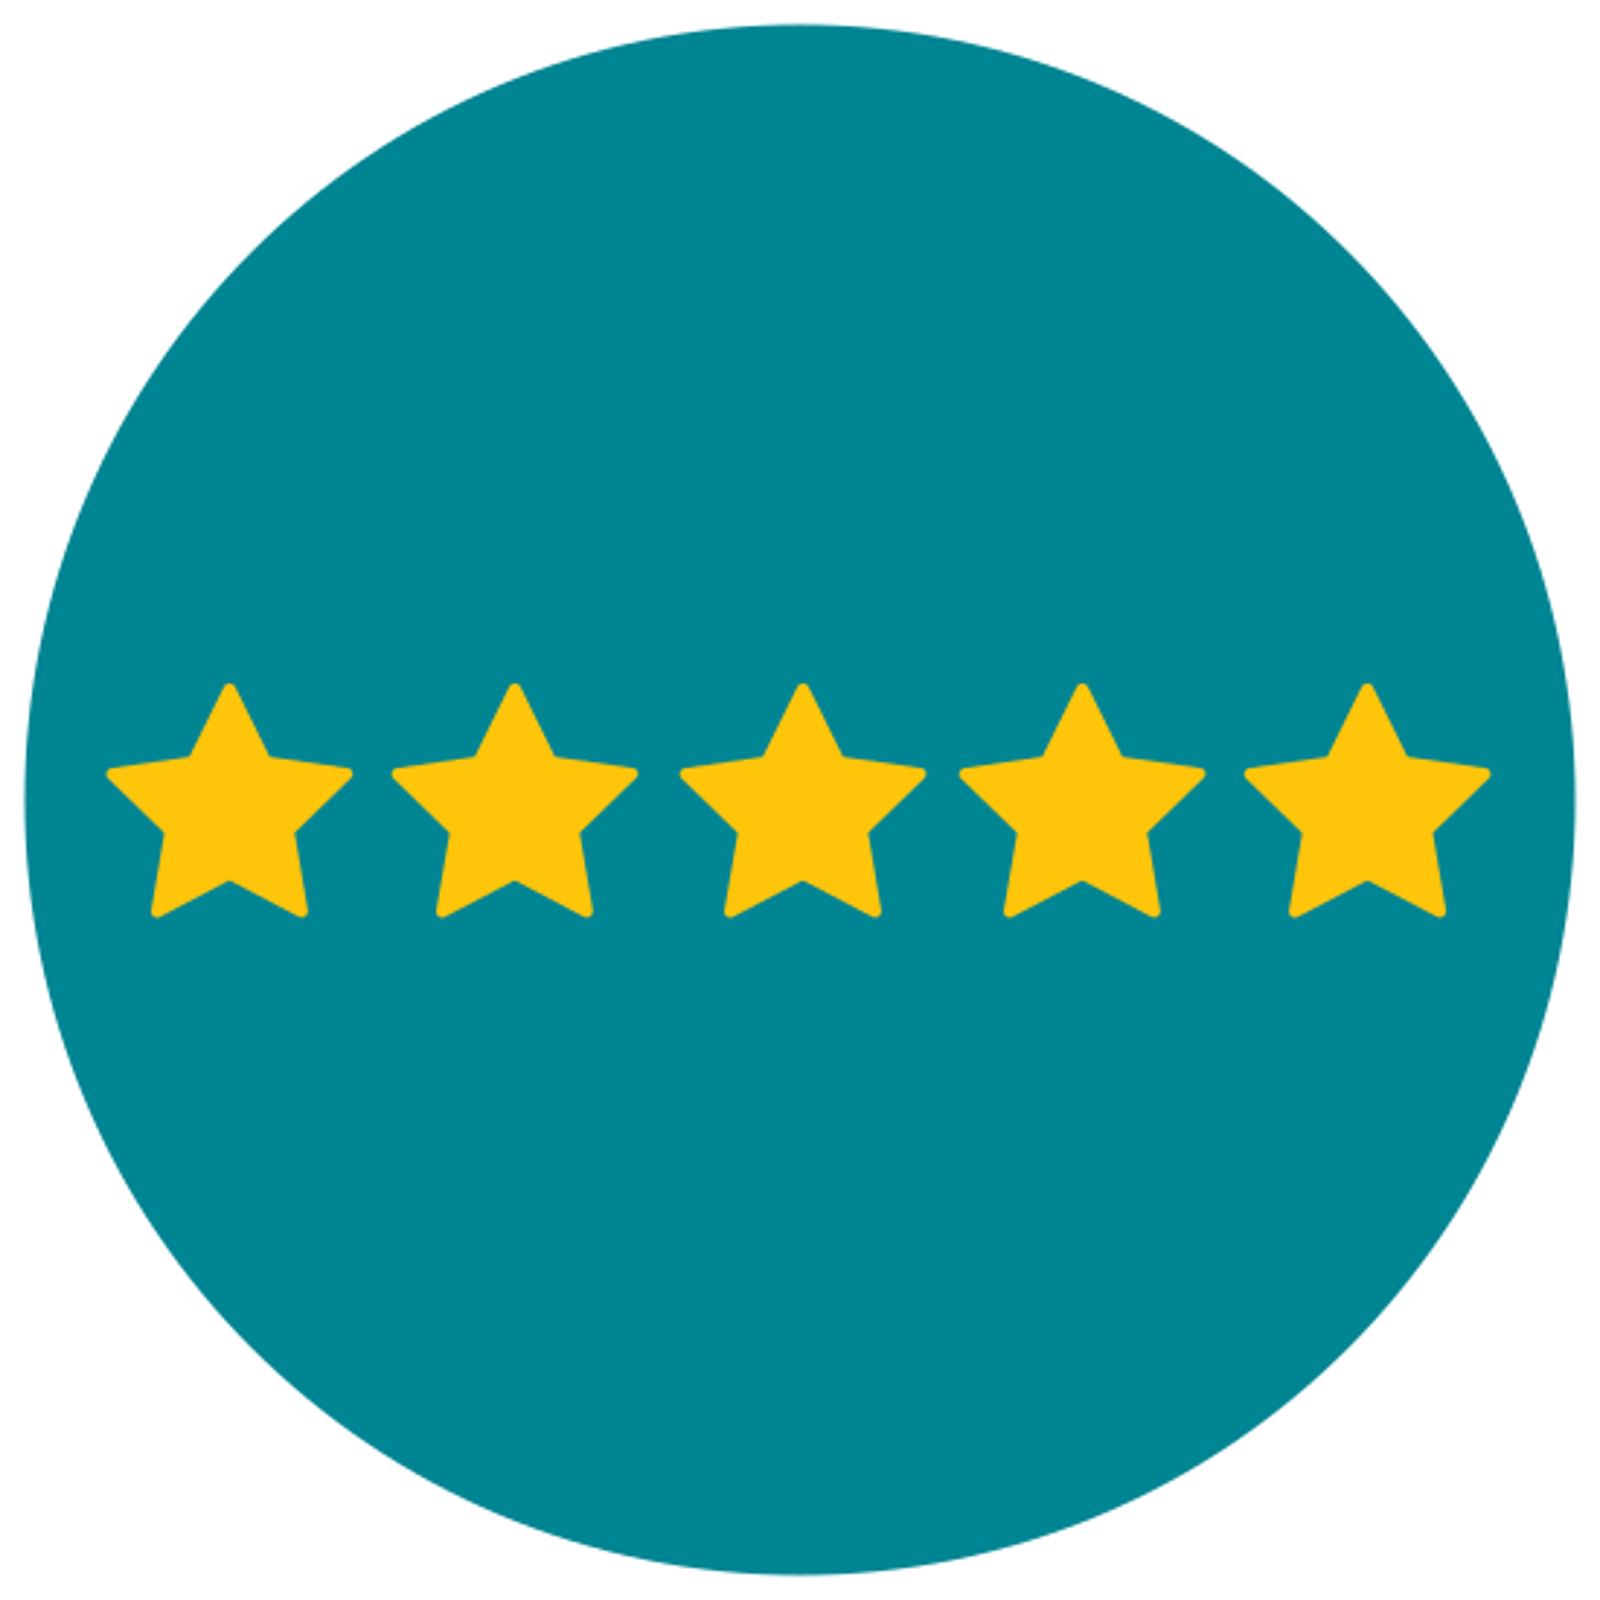 Five of Five Stars icon